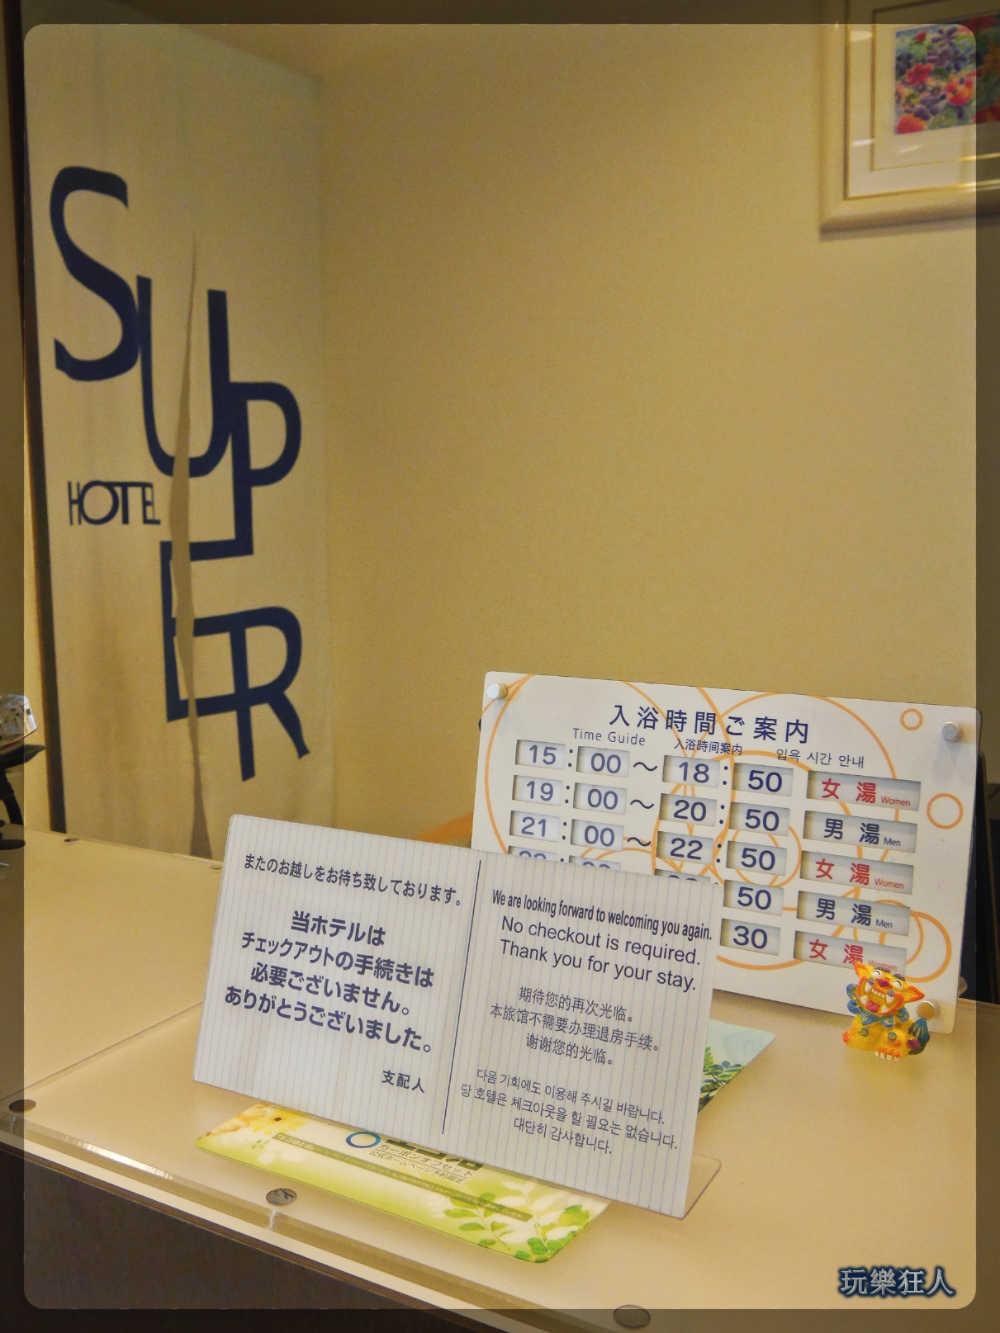 『Super Hotel』名護店-免退房說明